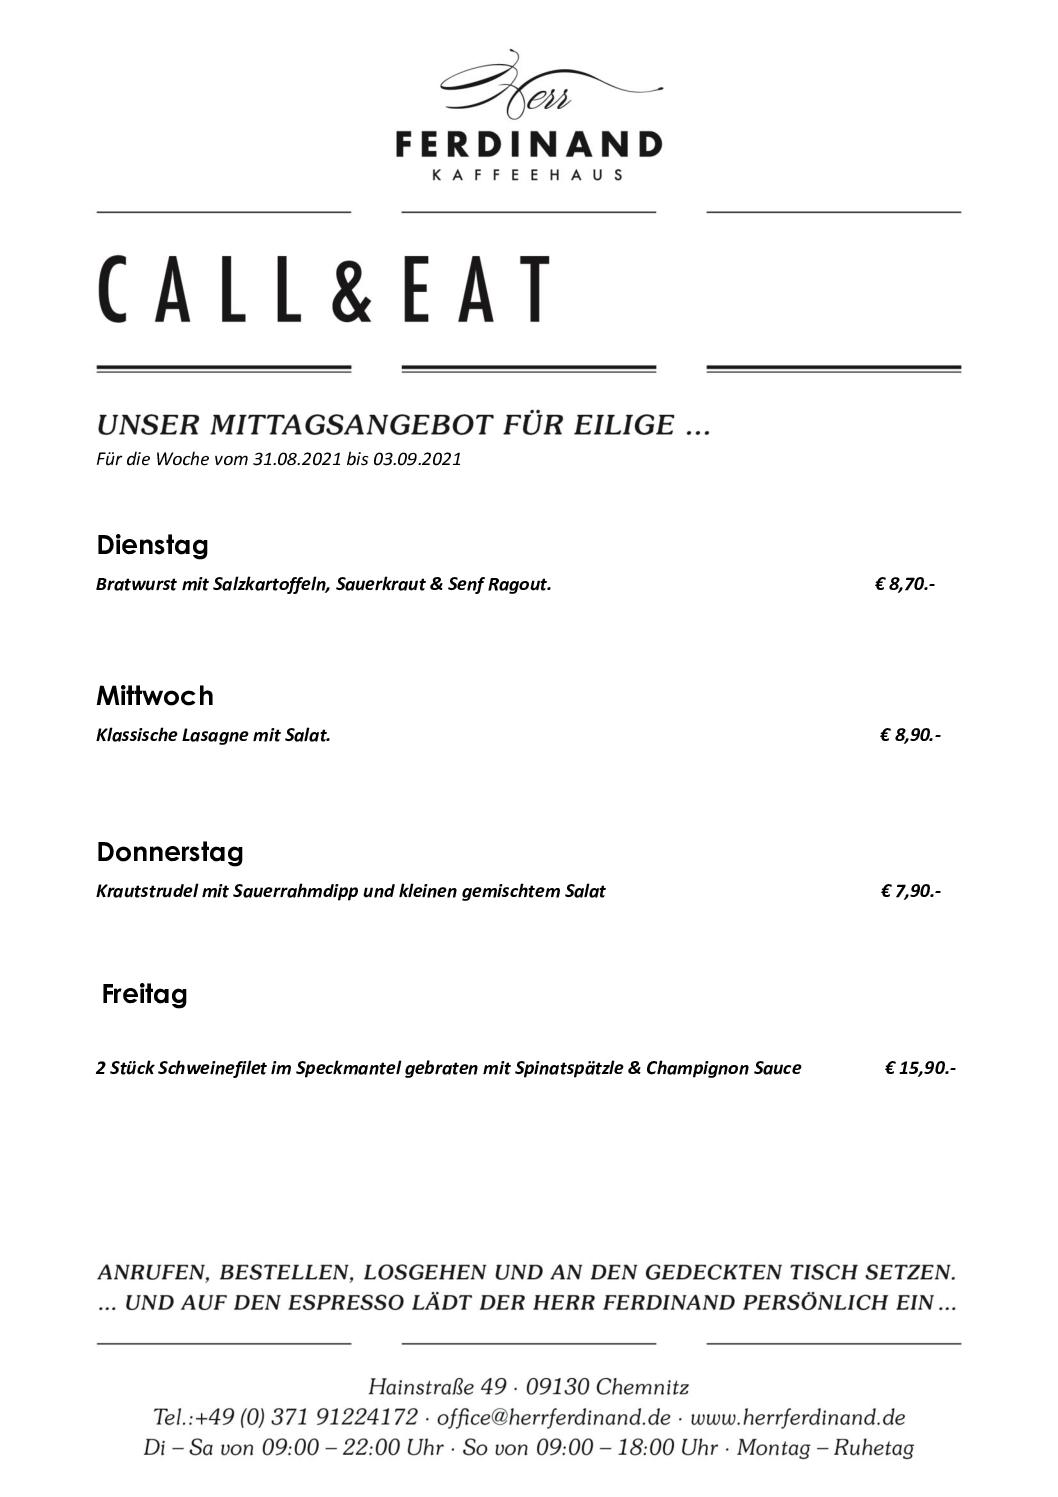 Vorlage_aktuell_Call Eat_20191017